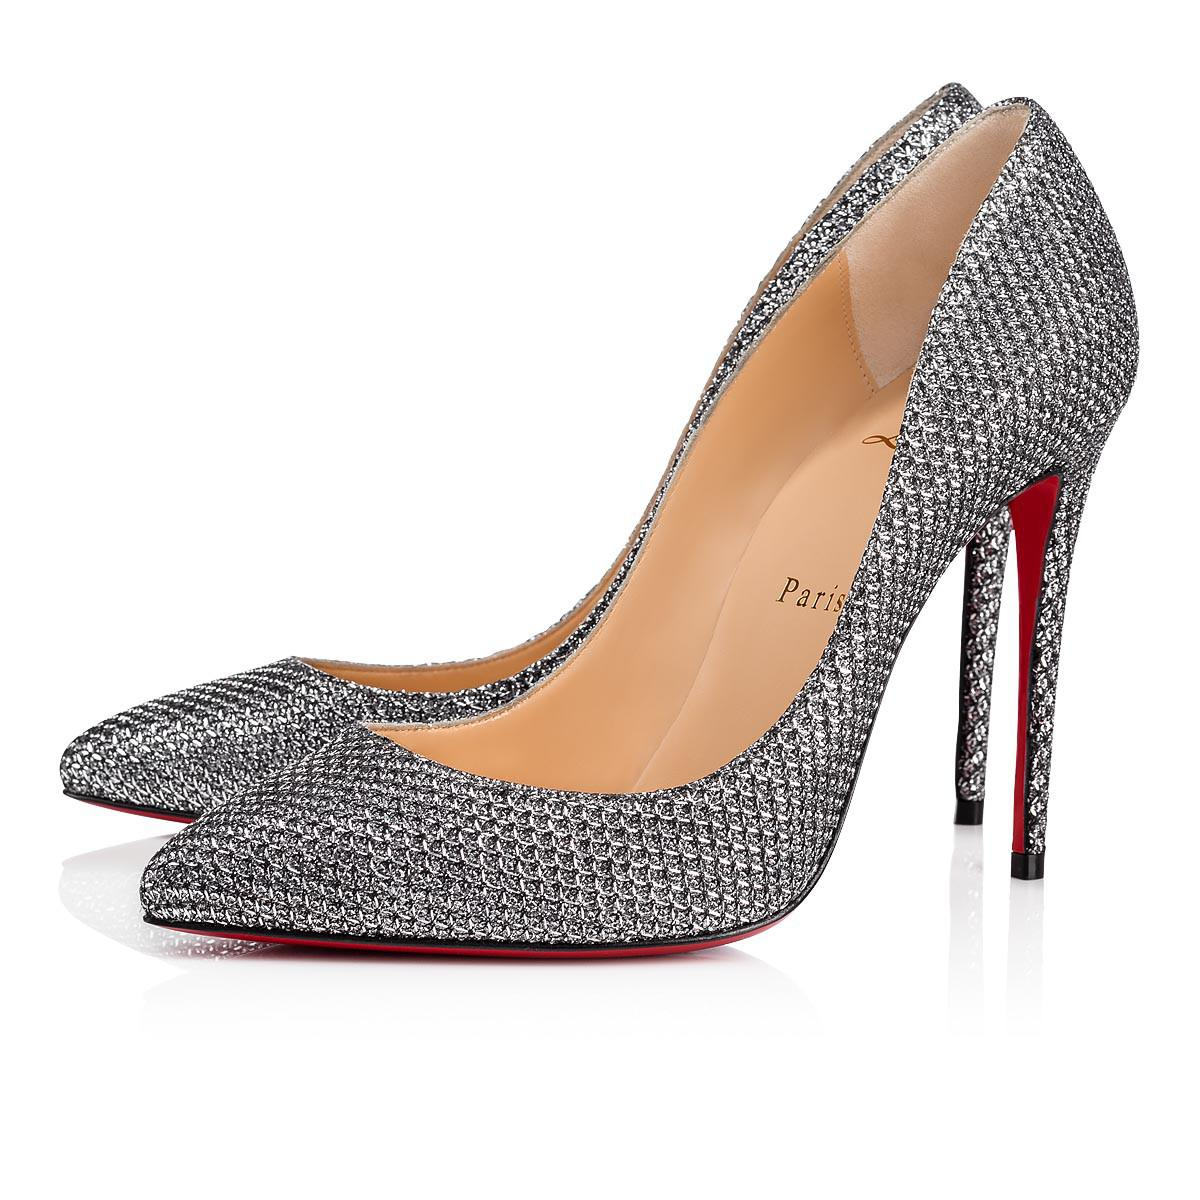 buy popular ca295 9e17b Christian Louboutin Pigalle Follies Glitter Diams 100 Antic ...